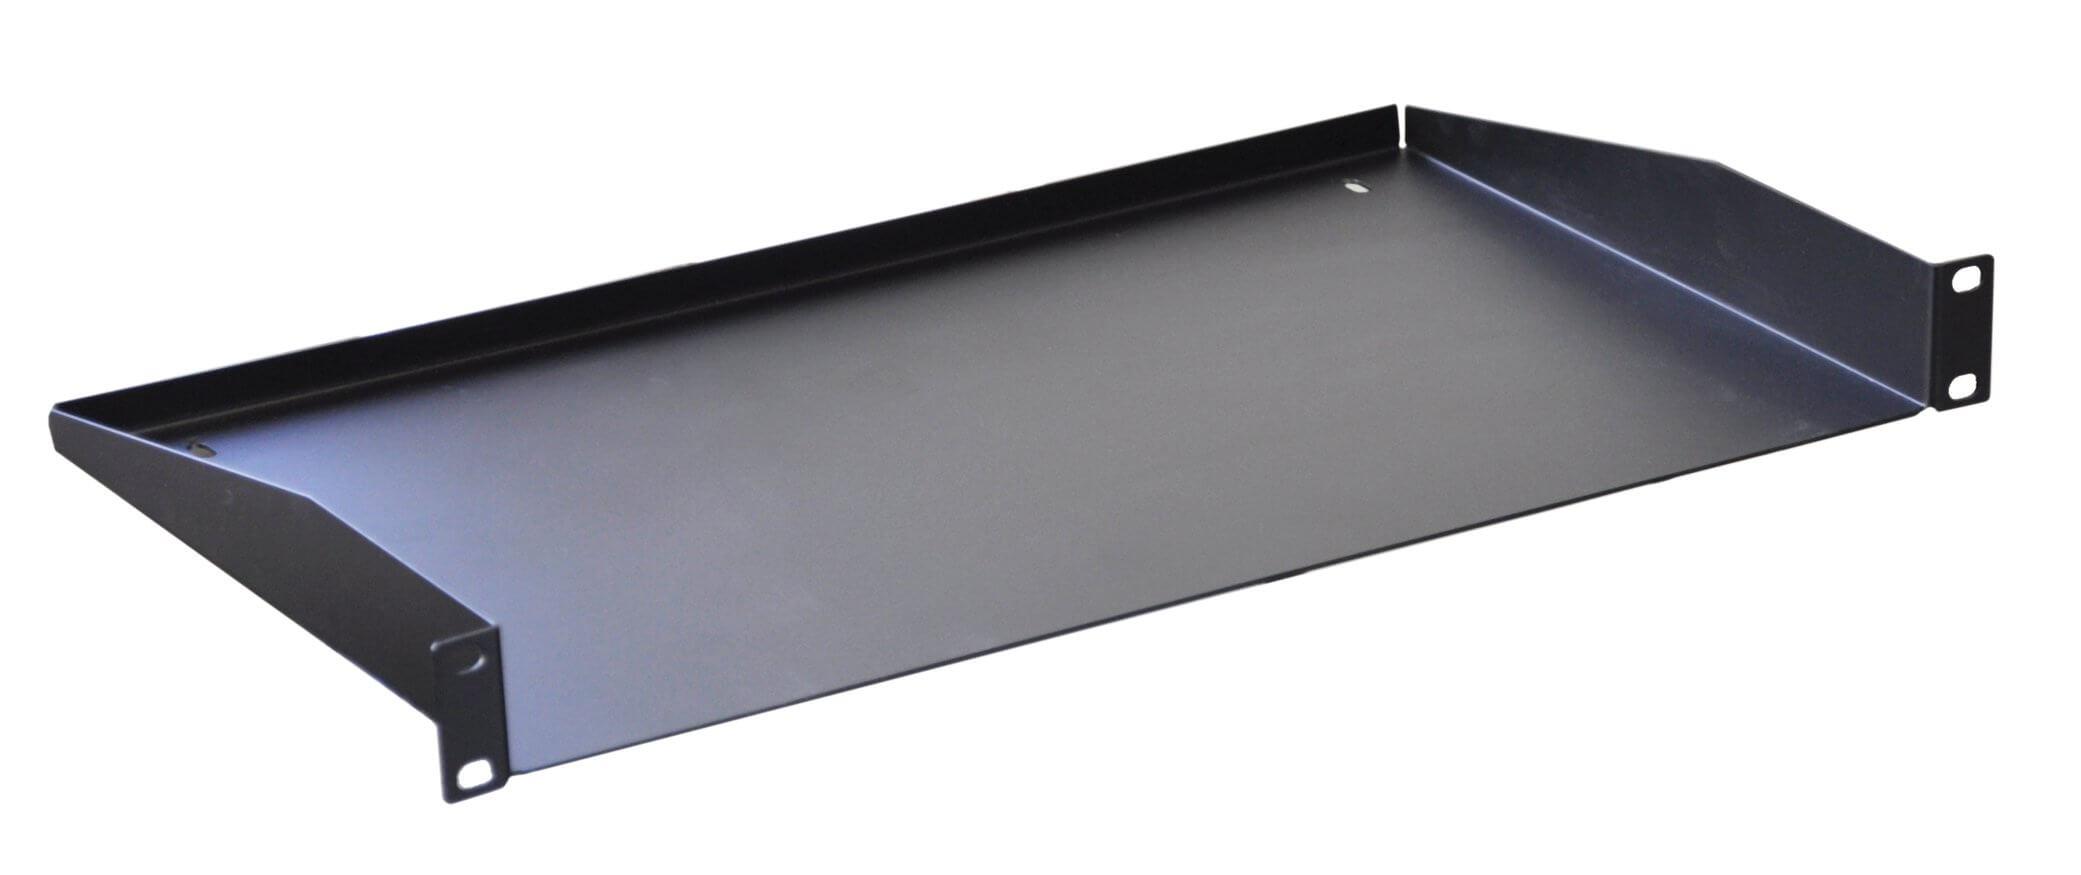 Soundlab Steel Rack Tray 1U